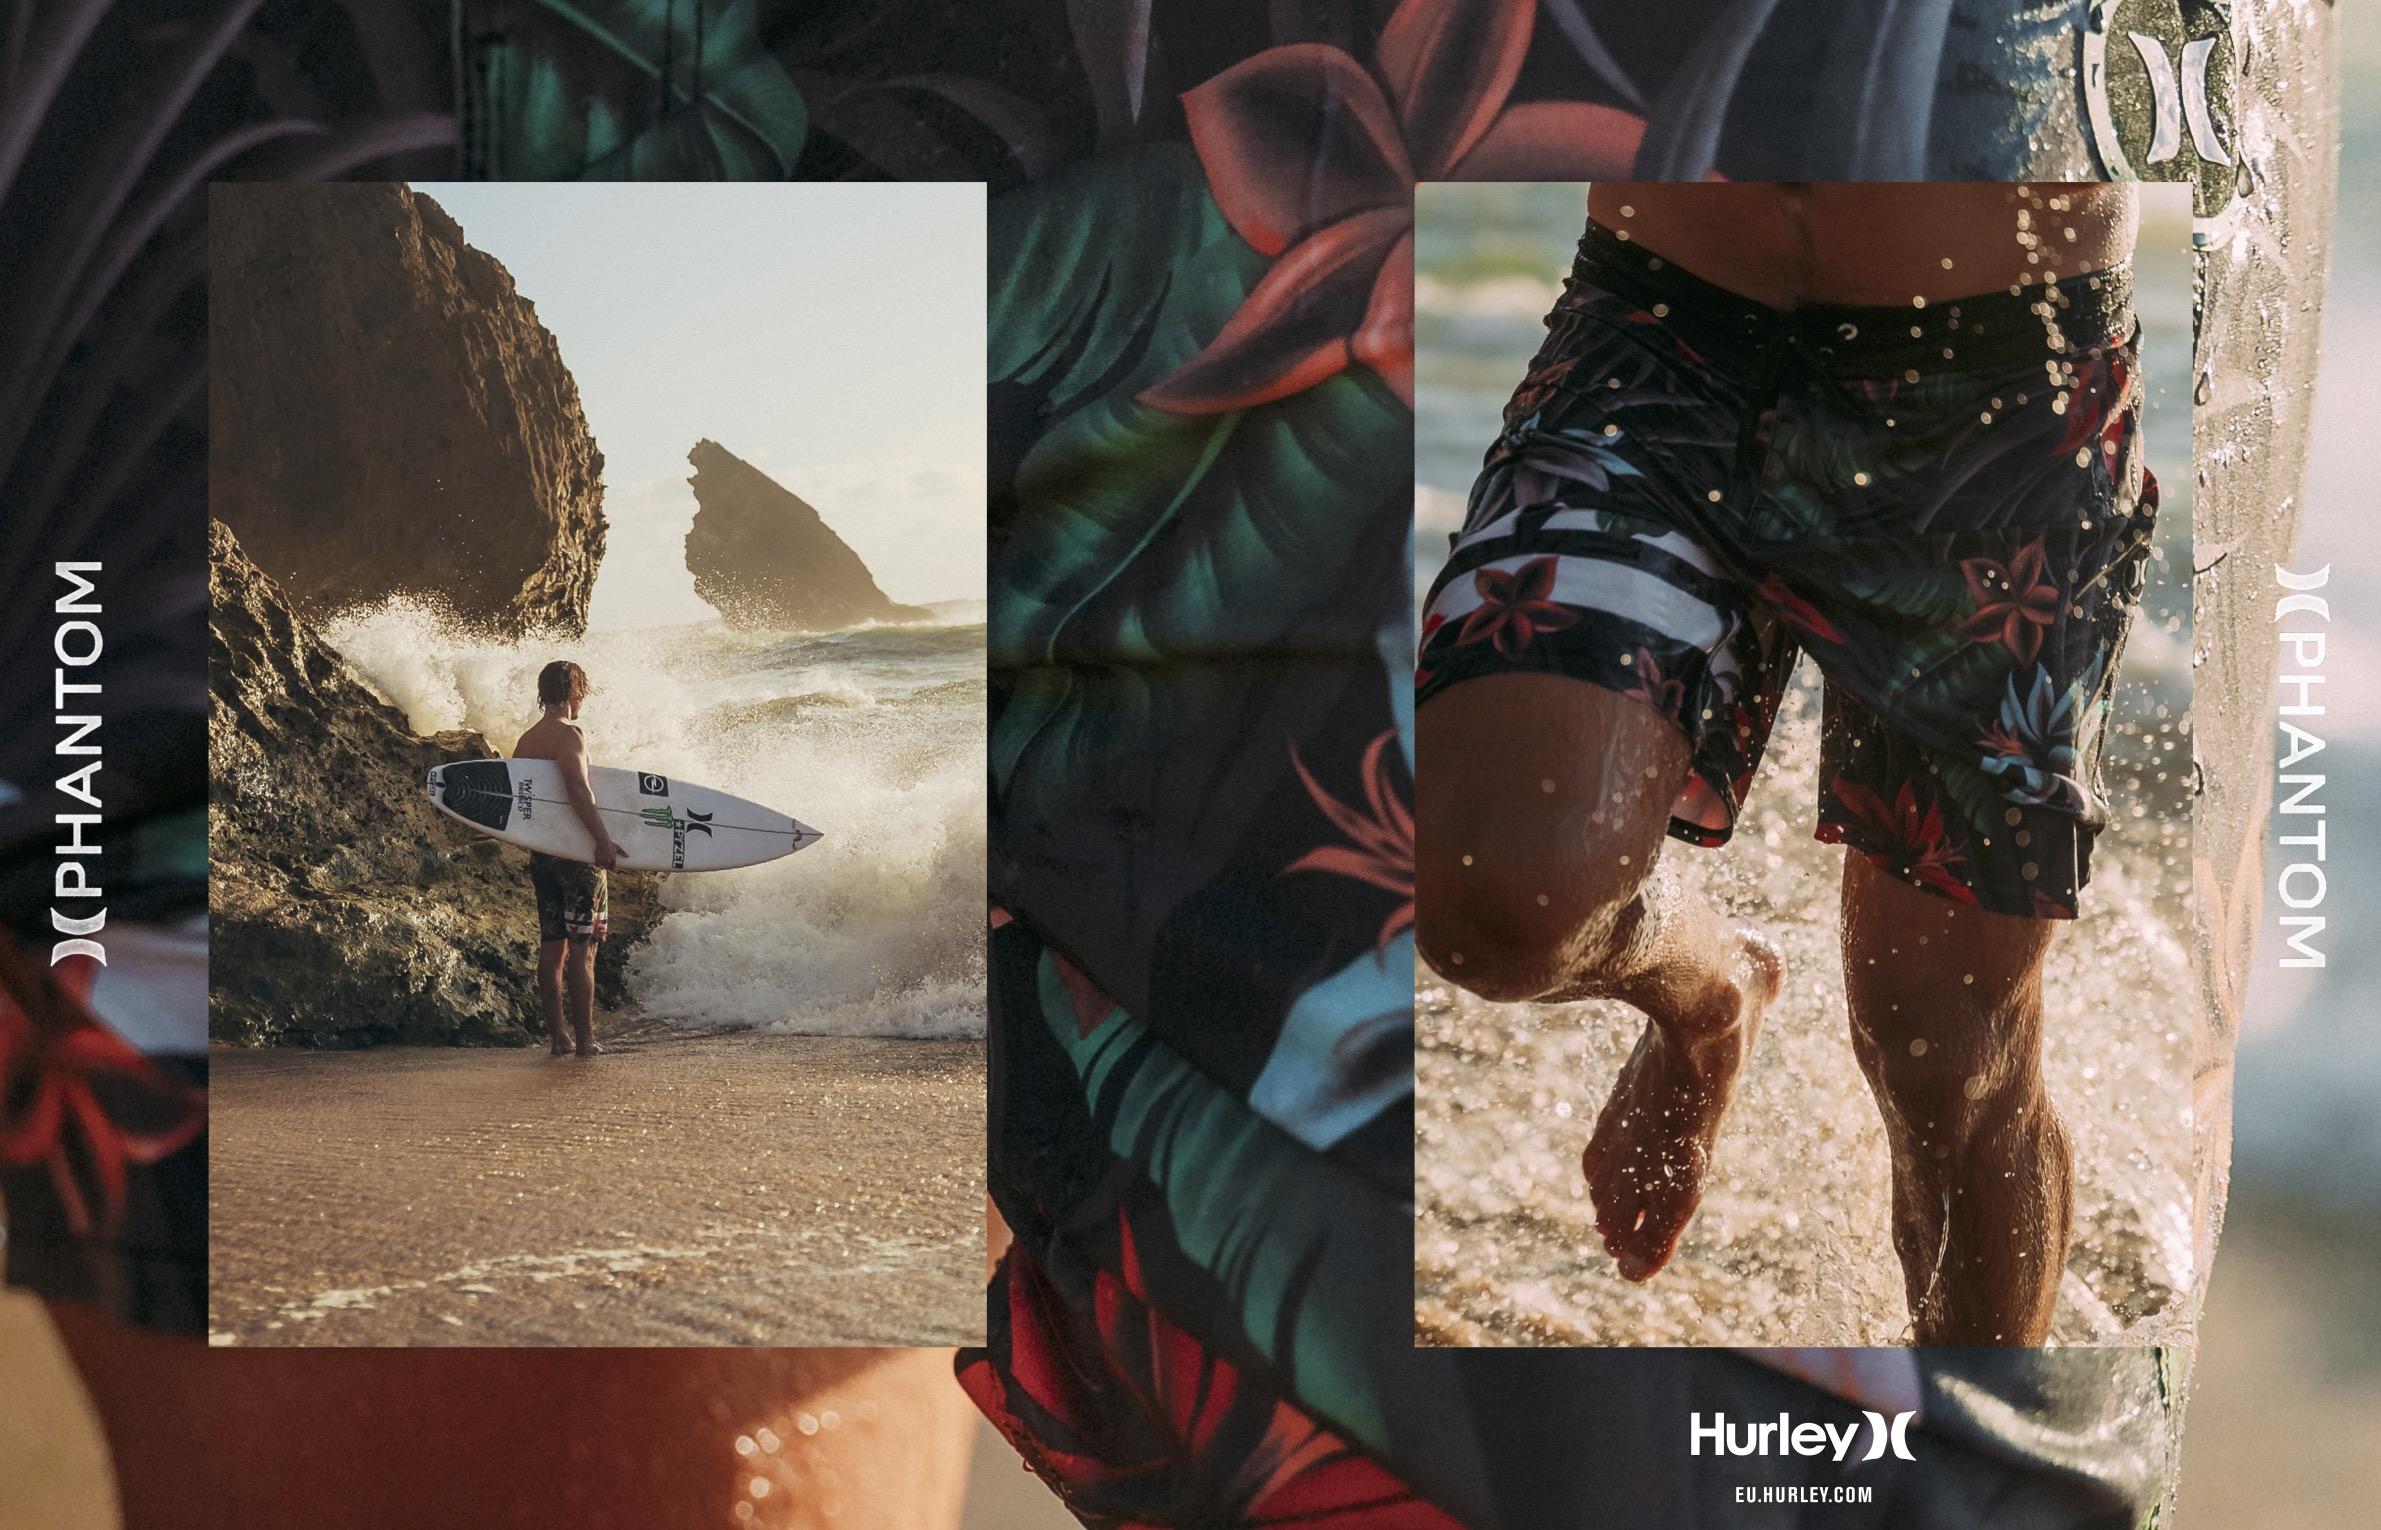 107 Hurley boardshorts and women swimwear